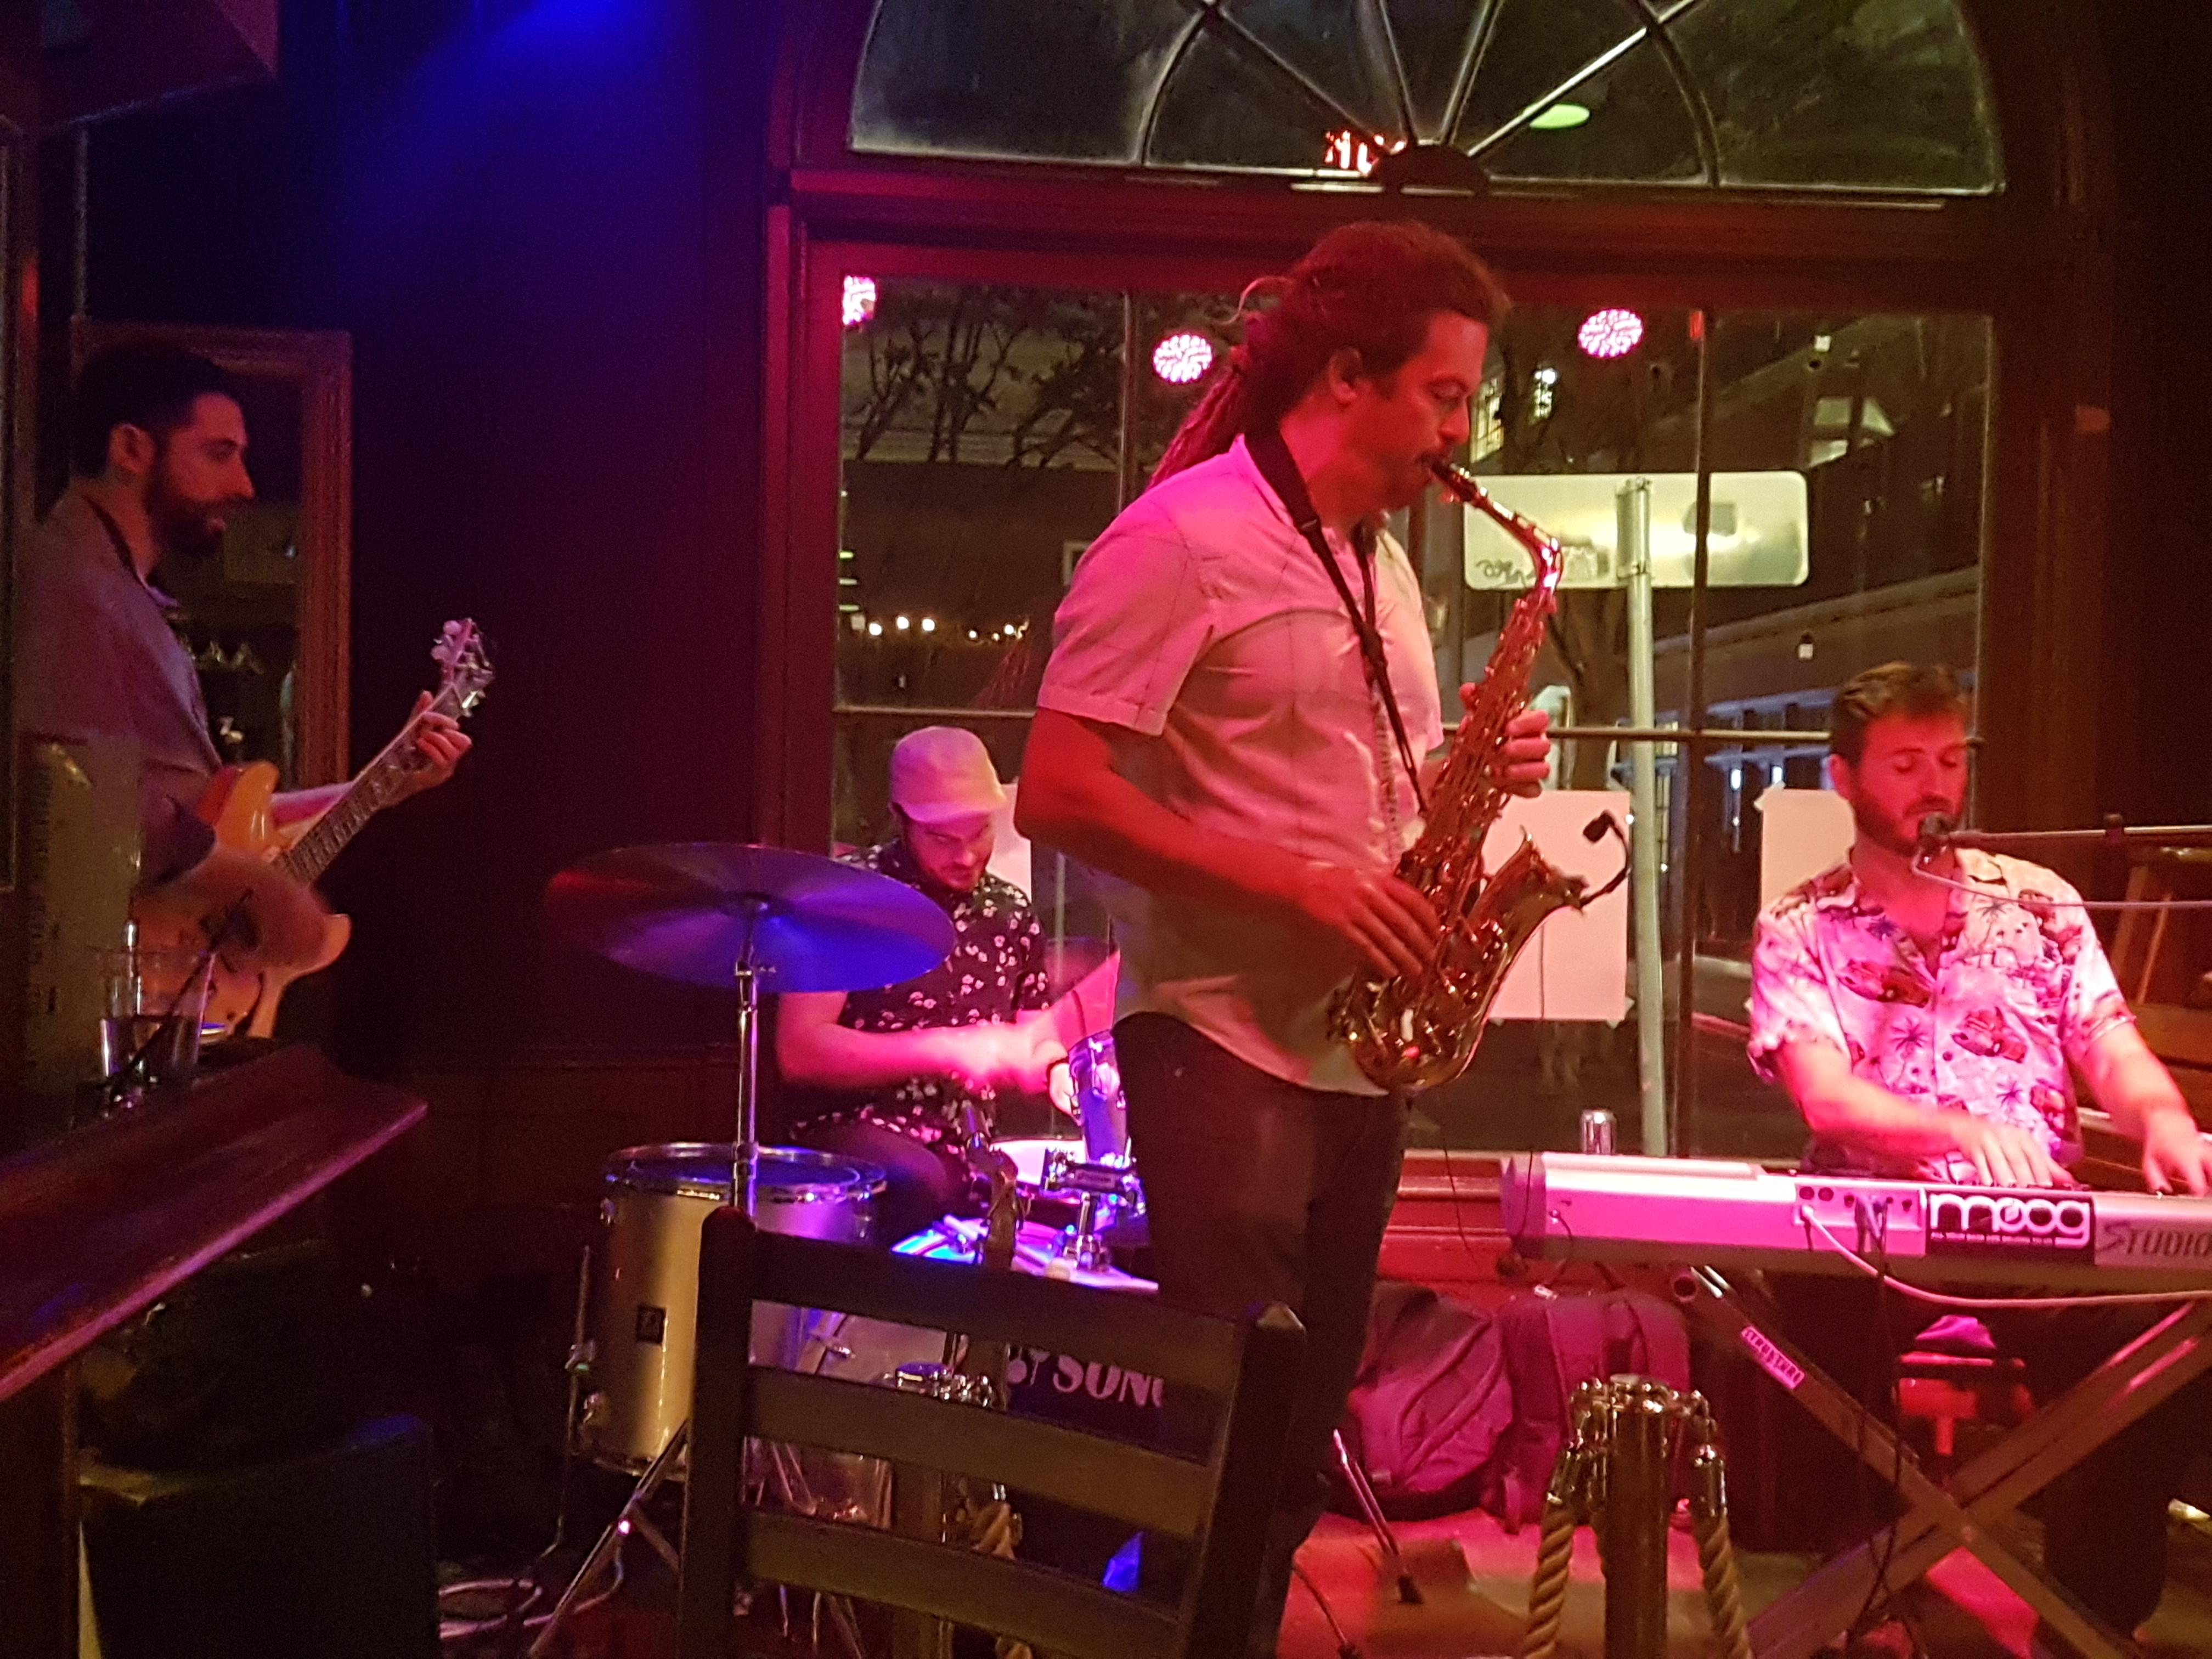 Jazz Funk guys at RF's